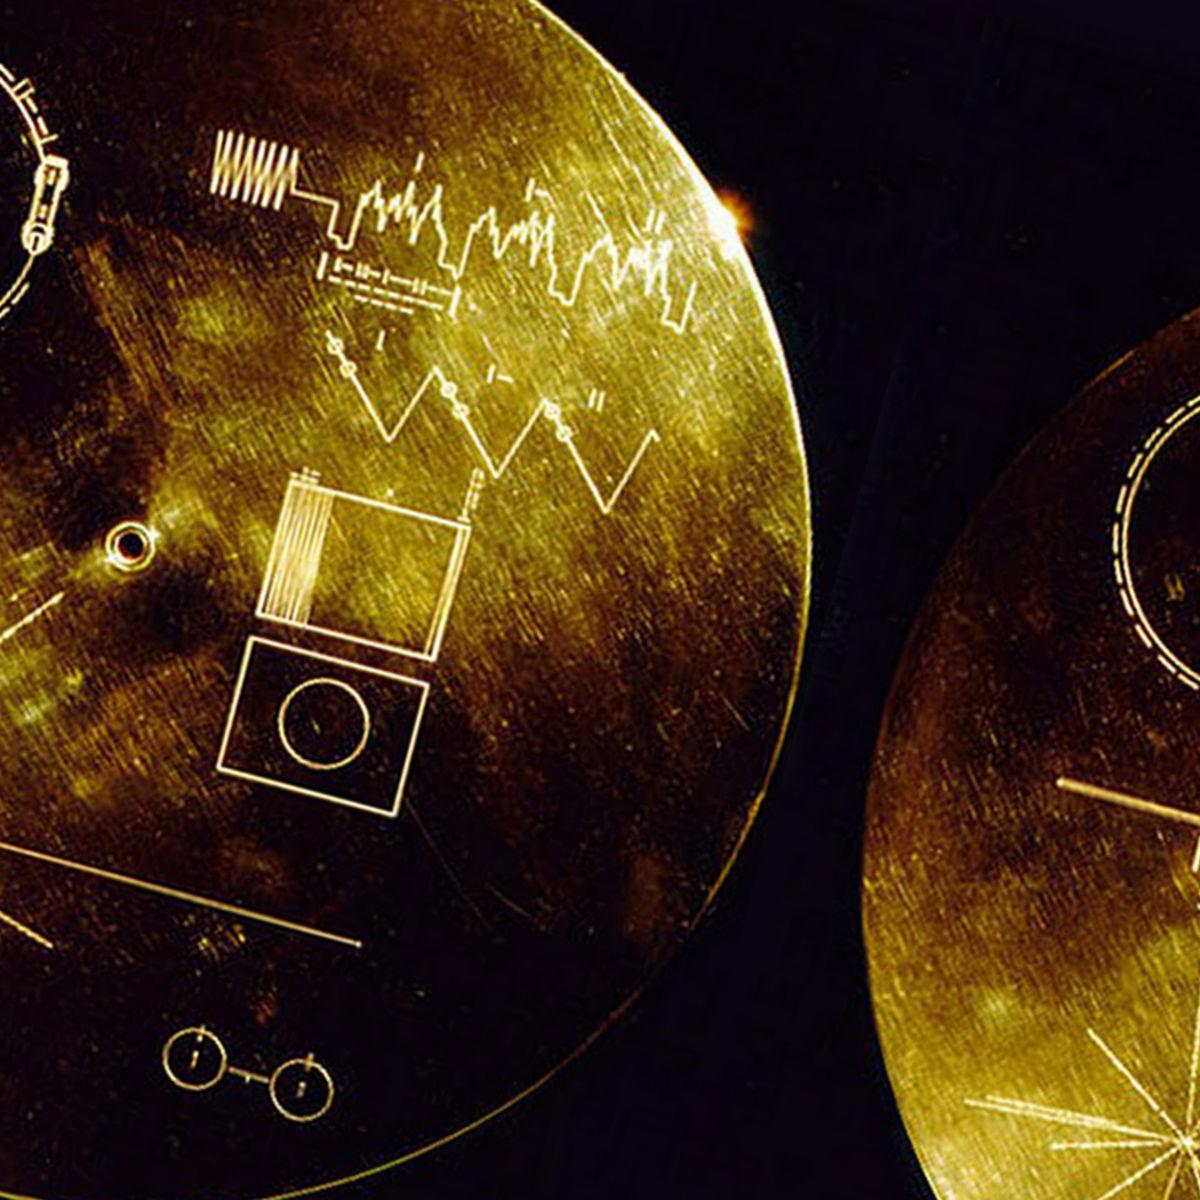 Golden-Record-Nasa-Voyager.jpg